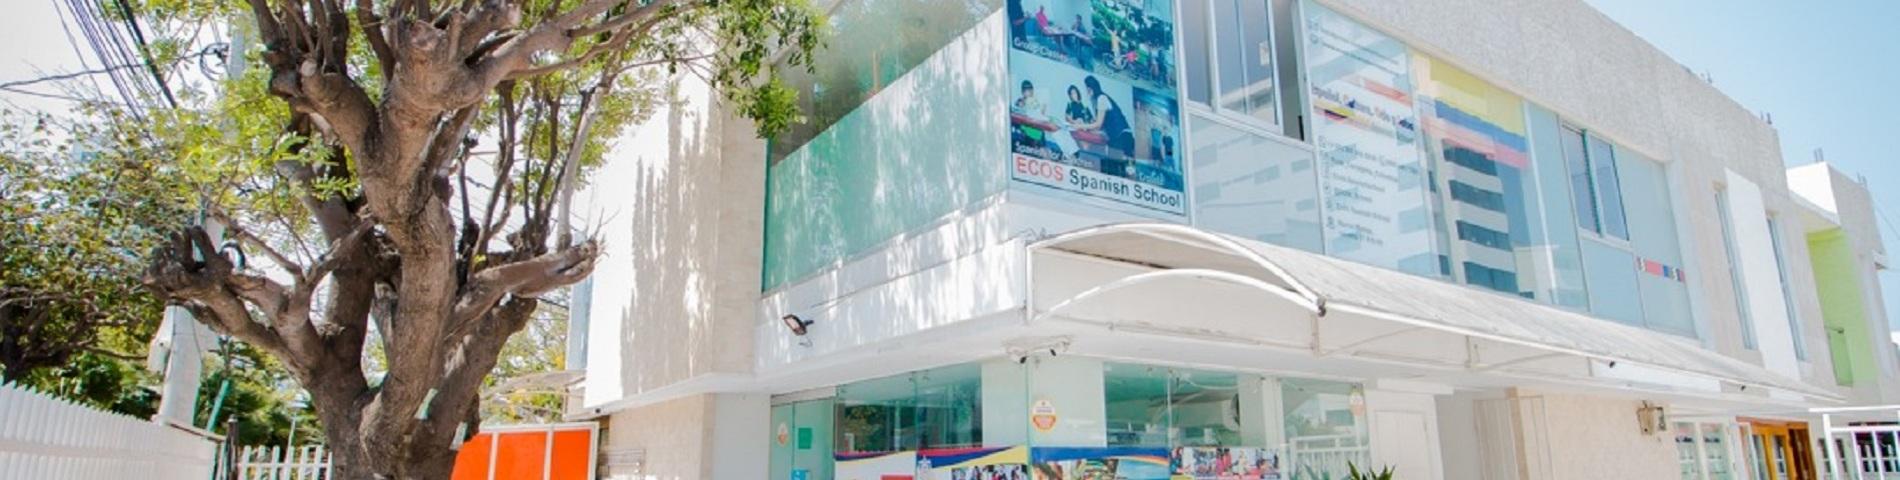 ECOS Spanish School foto 1